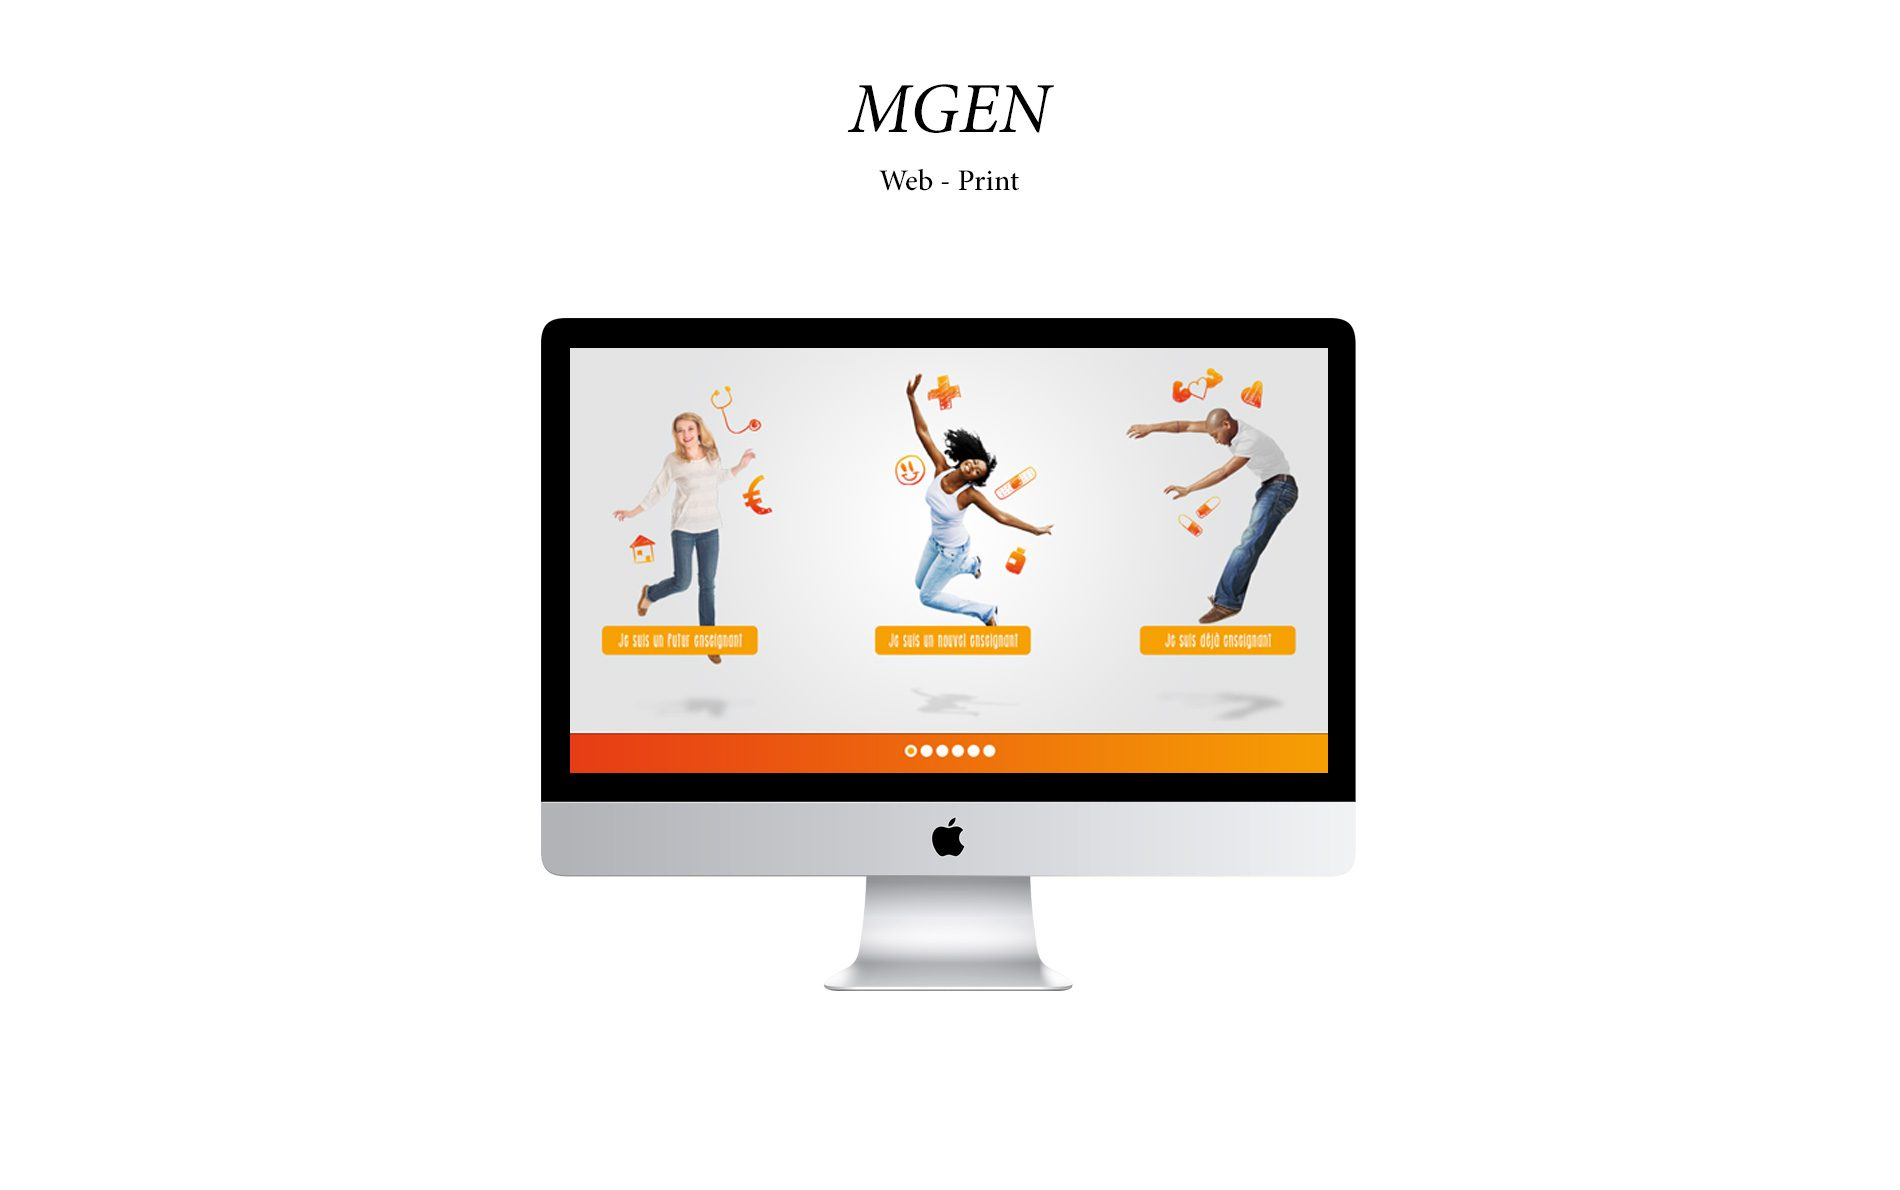 mgen_02